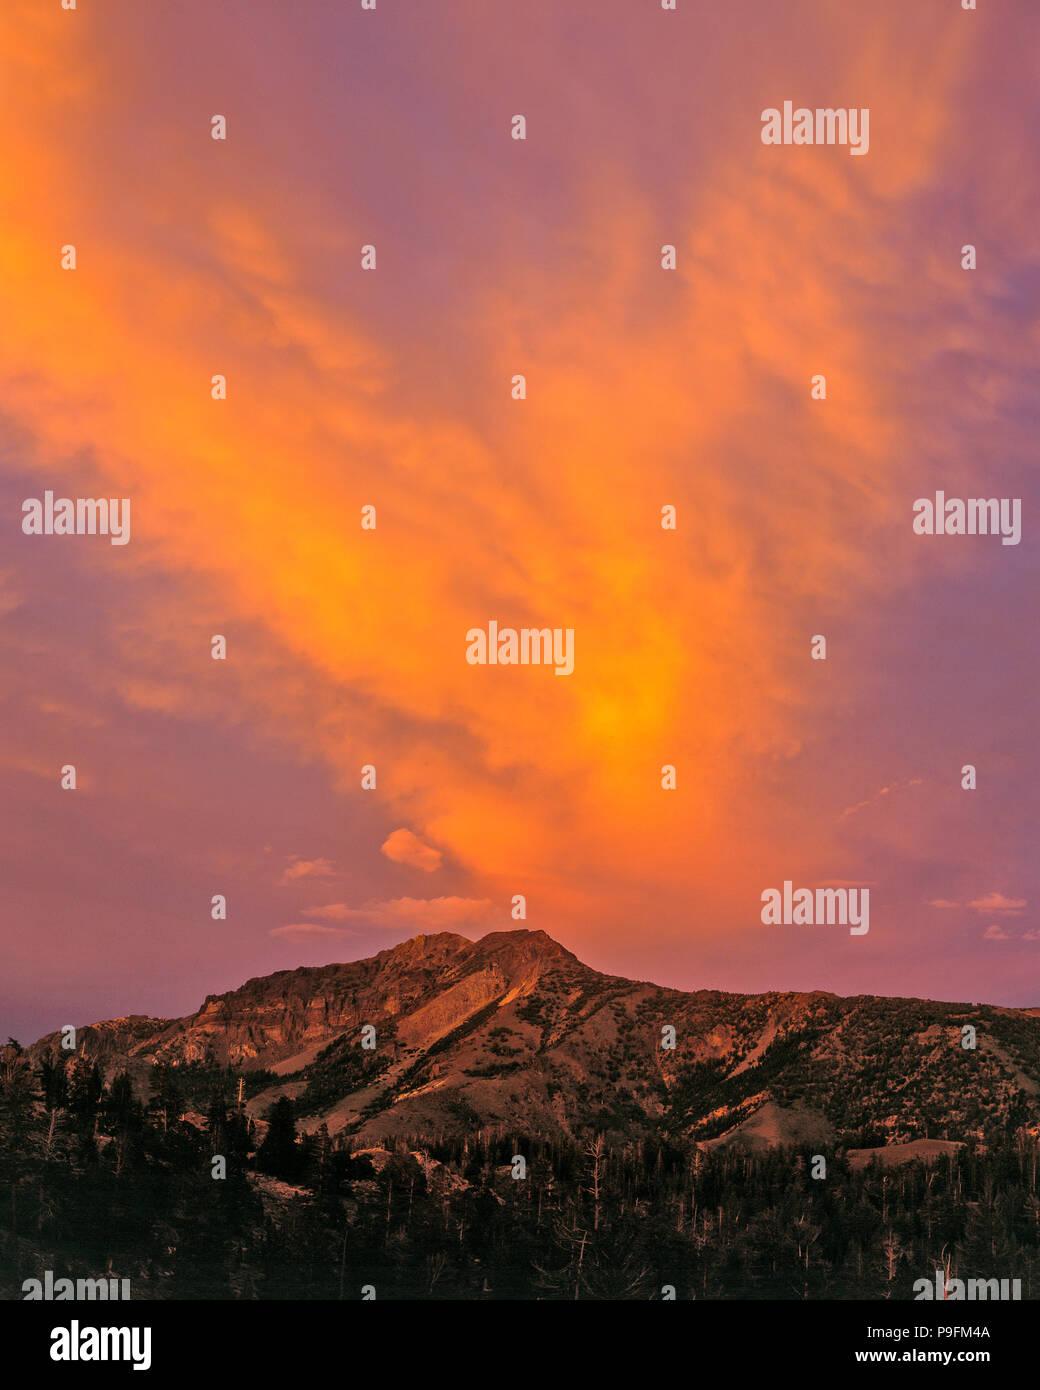 Sunset, Silver Peak, Carson-Iceberg Wilderness, Stanislaus National Forest, Sierra Nevada Mountains, California - Stock Image